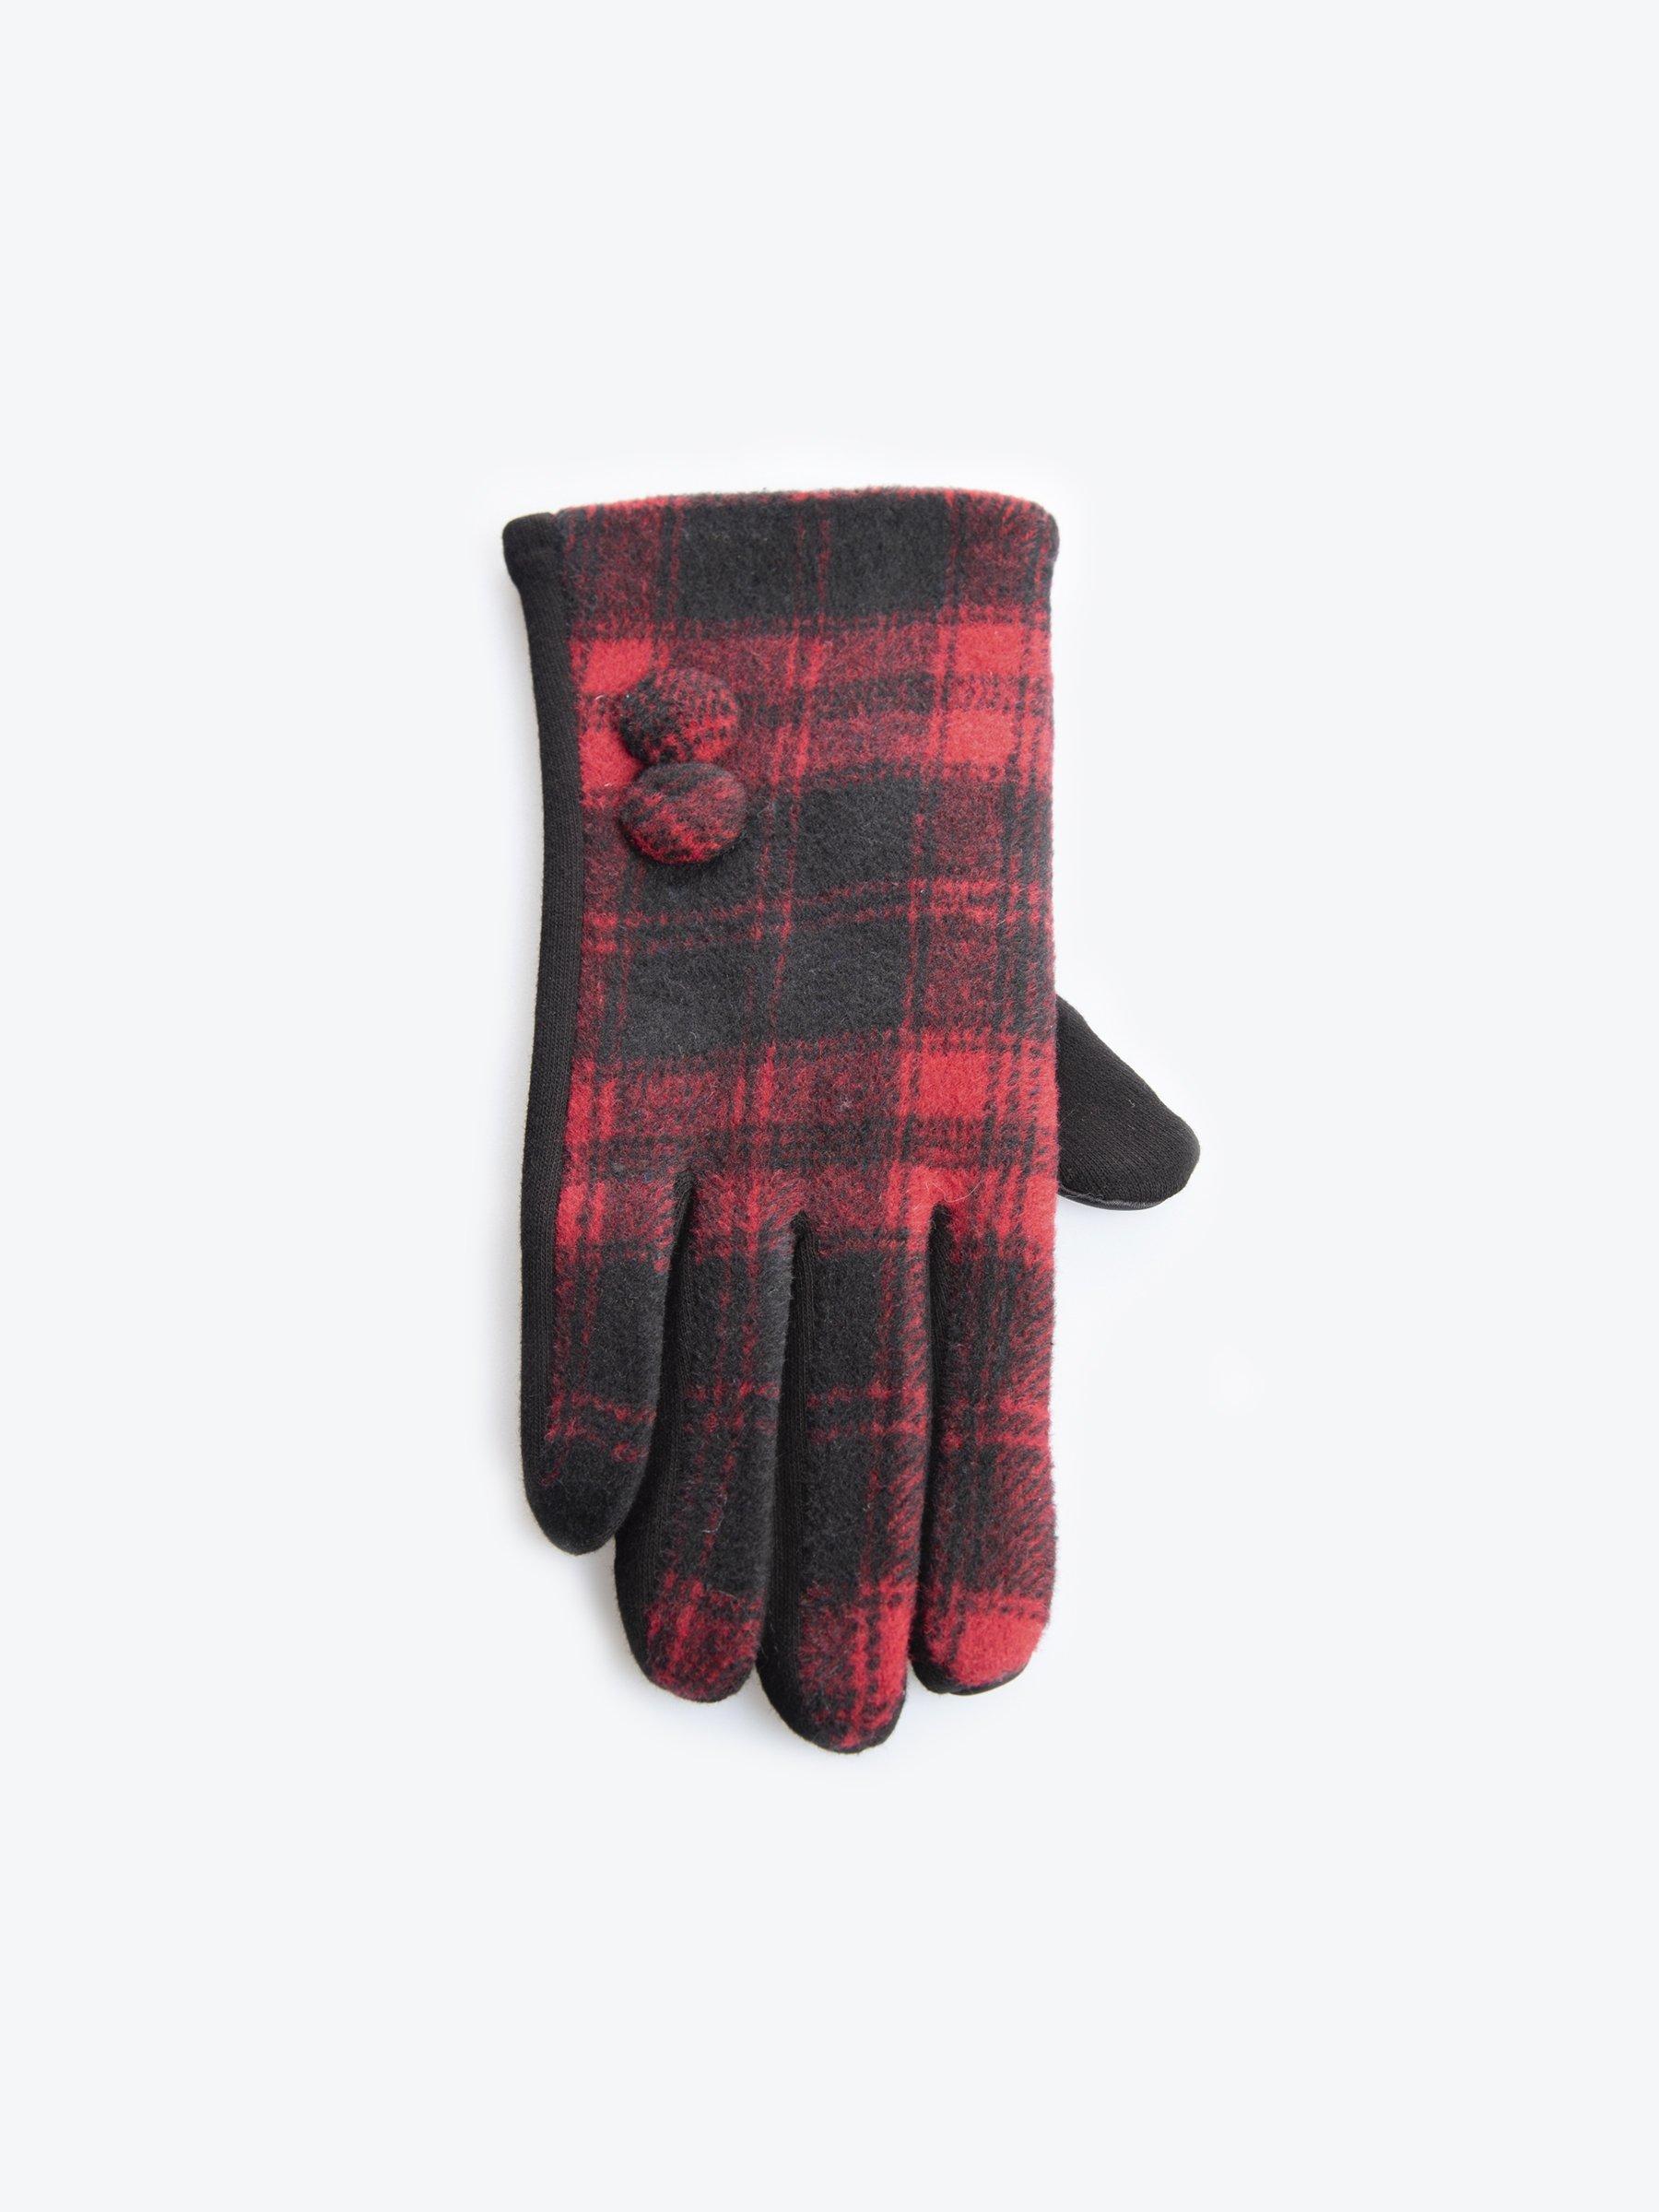 Size 7 Tartan Plaid Women Gloves